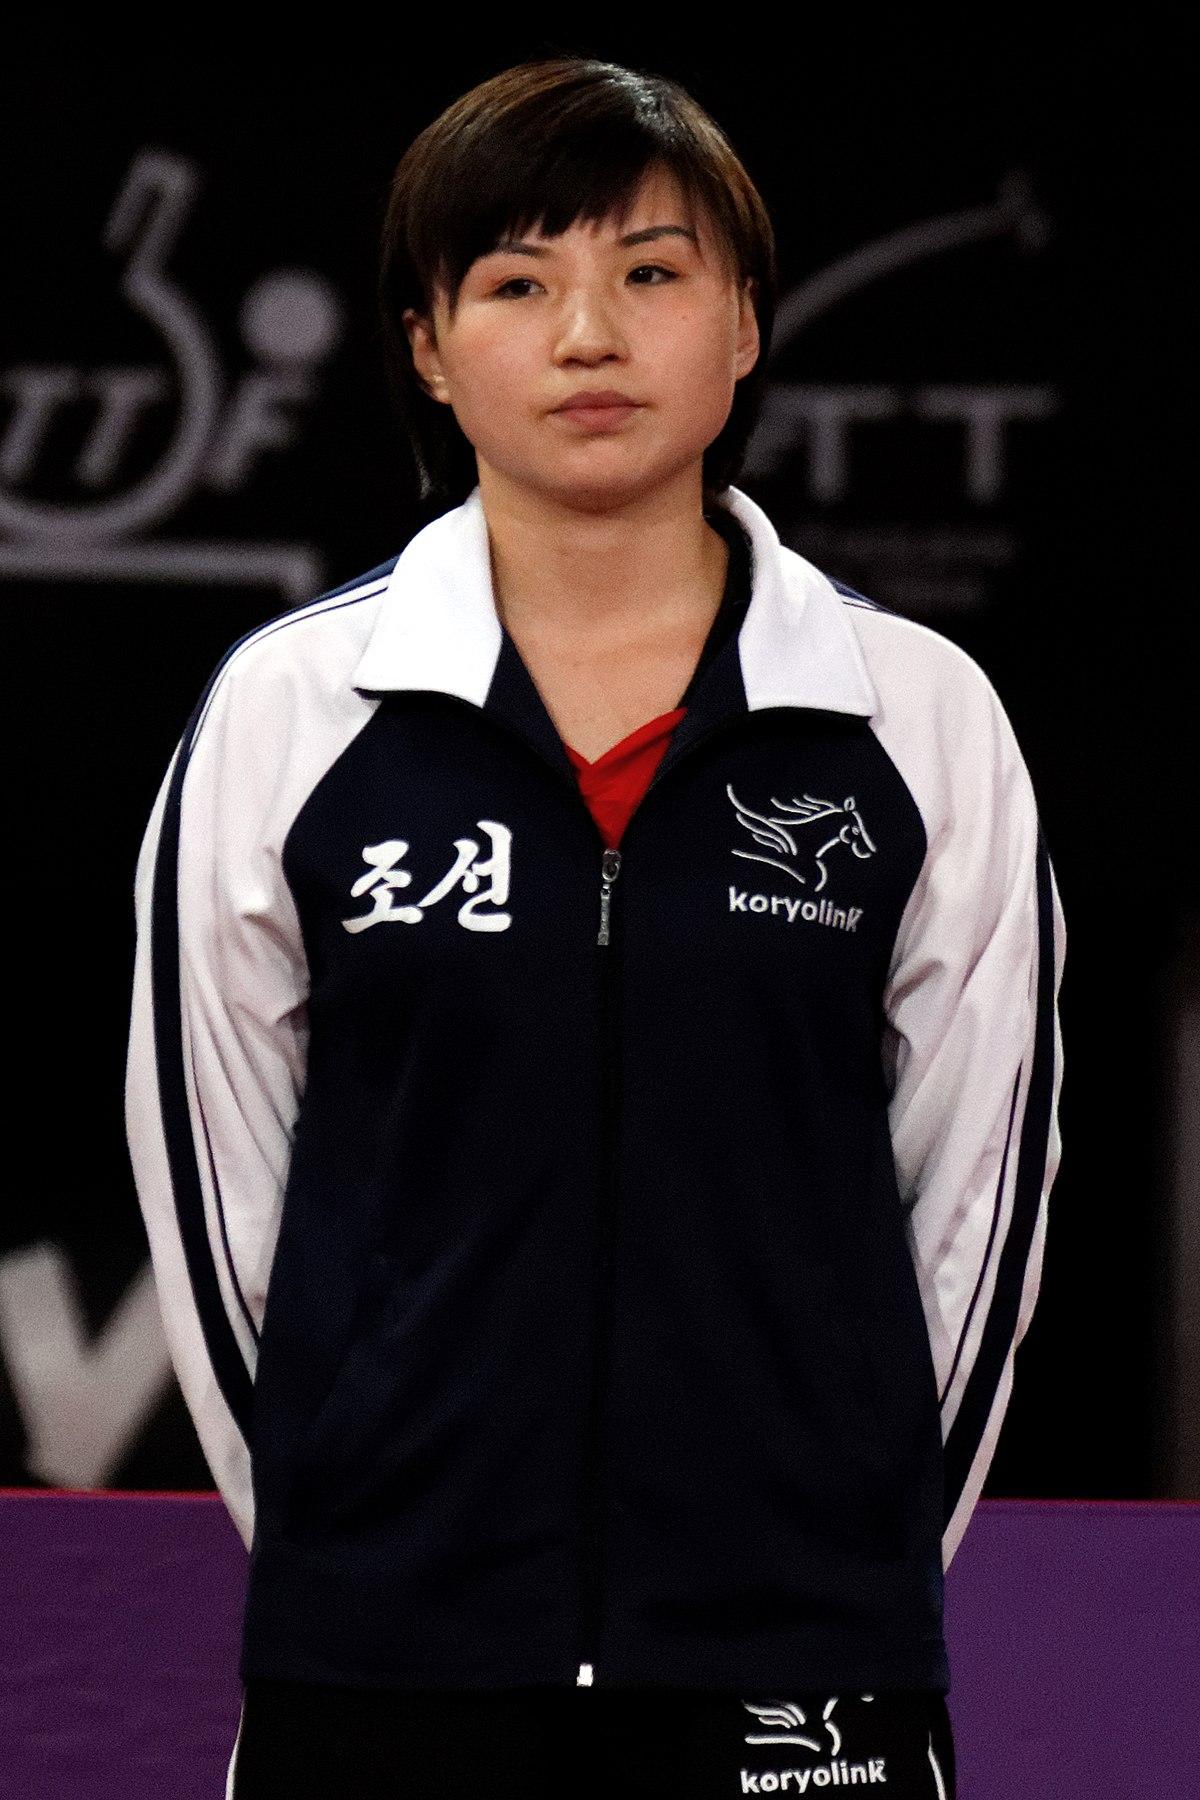 Forum on this topic: Sophia Lillis, anna-sipos-11x-world-table-tennis-champion/